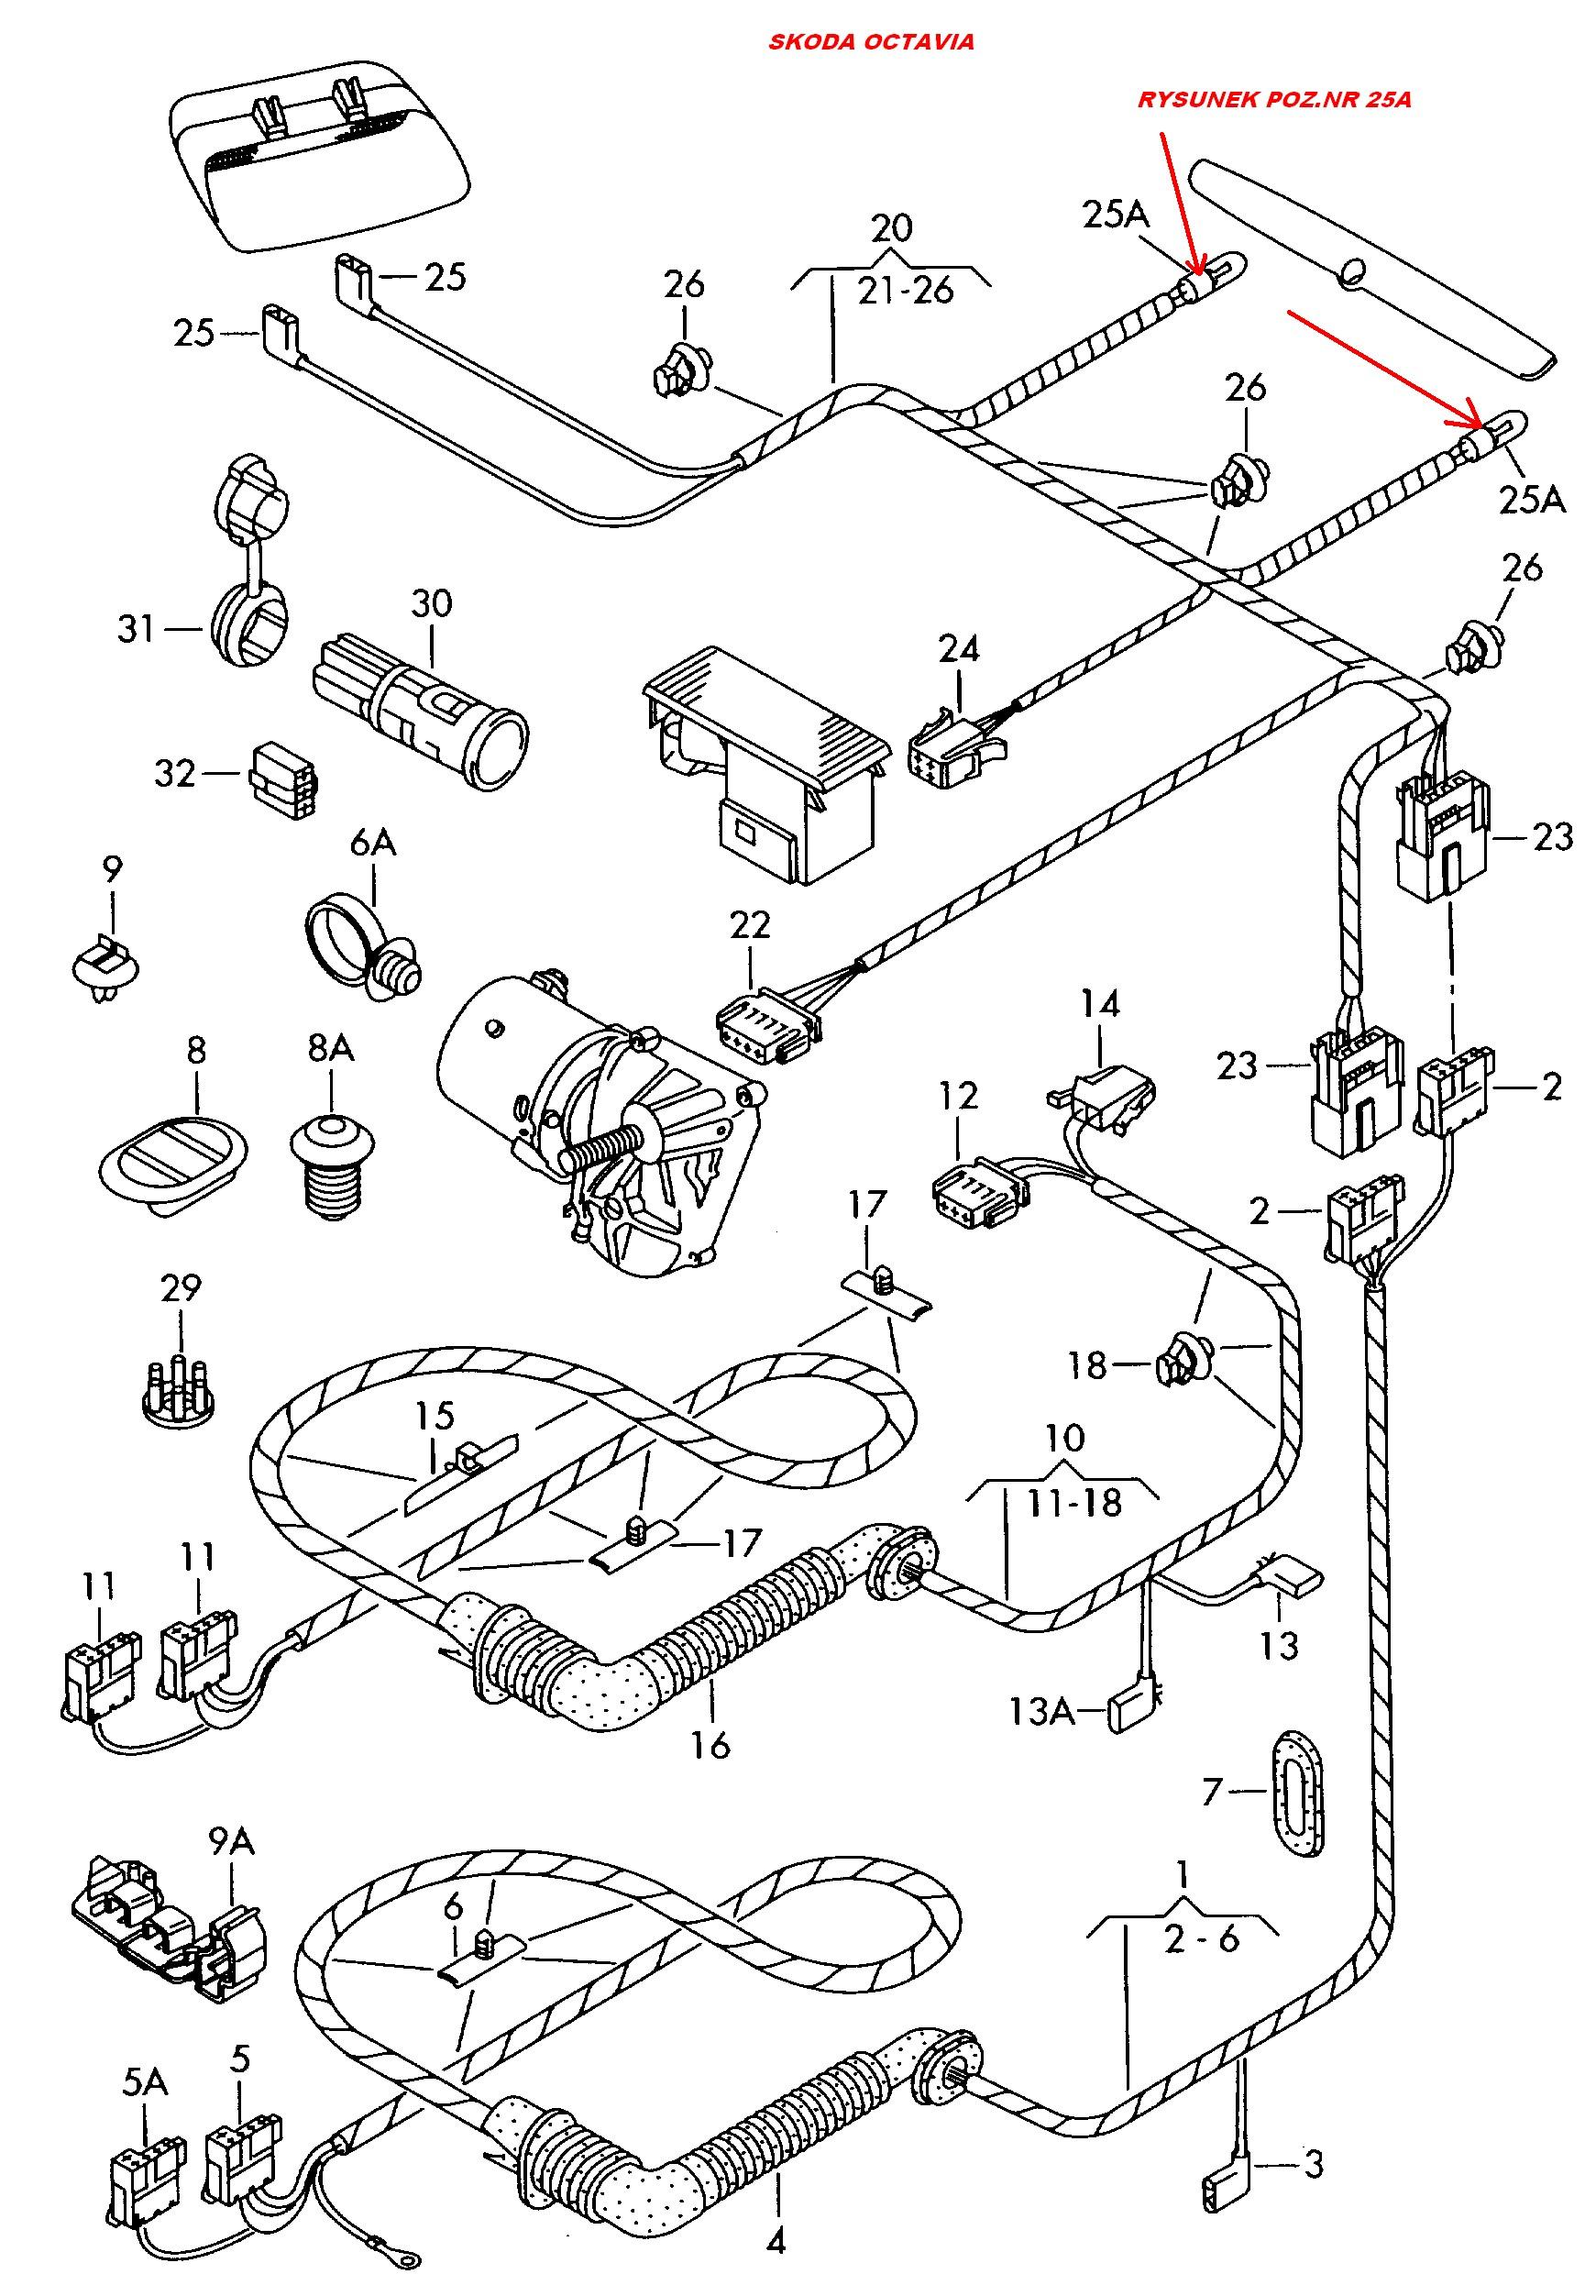 http://www.auto-truck3.pl/img/p/10005-21589.jpg